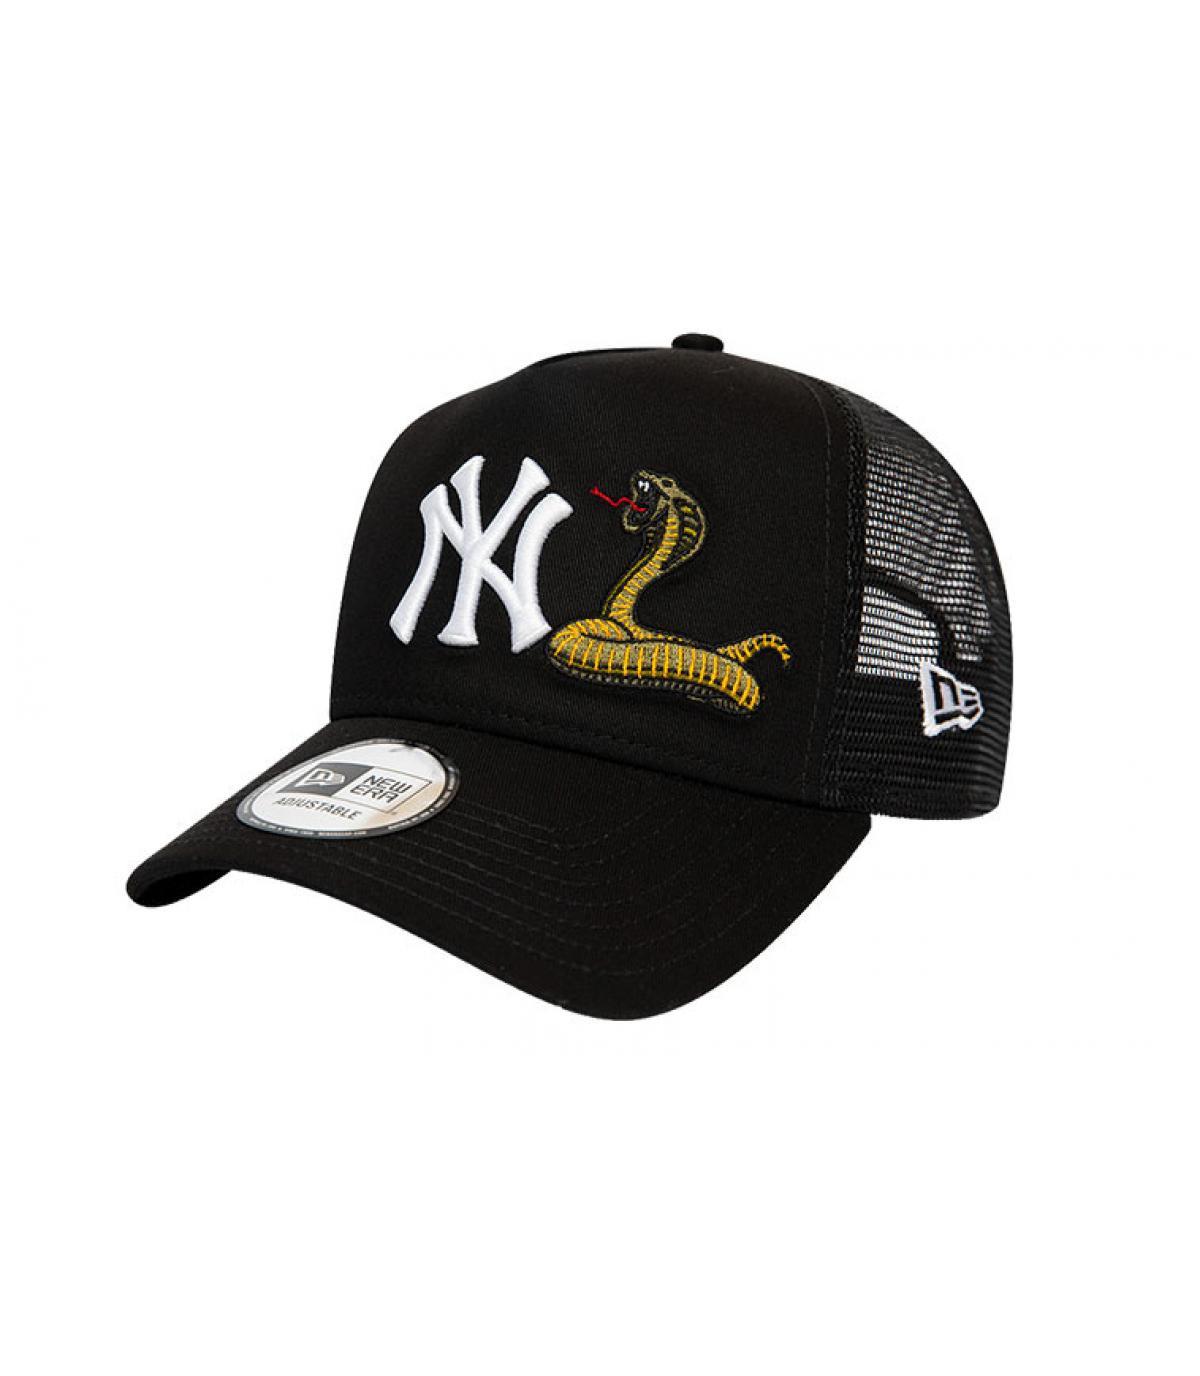 Détails Trucker MLB Twine NY black - image 2